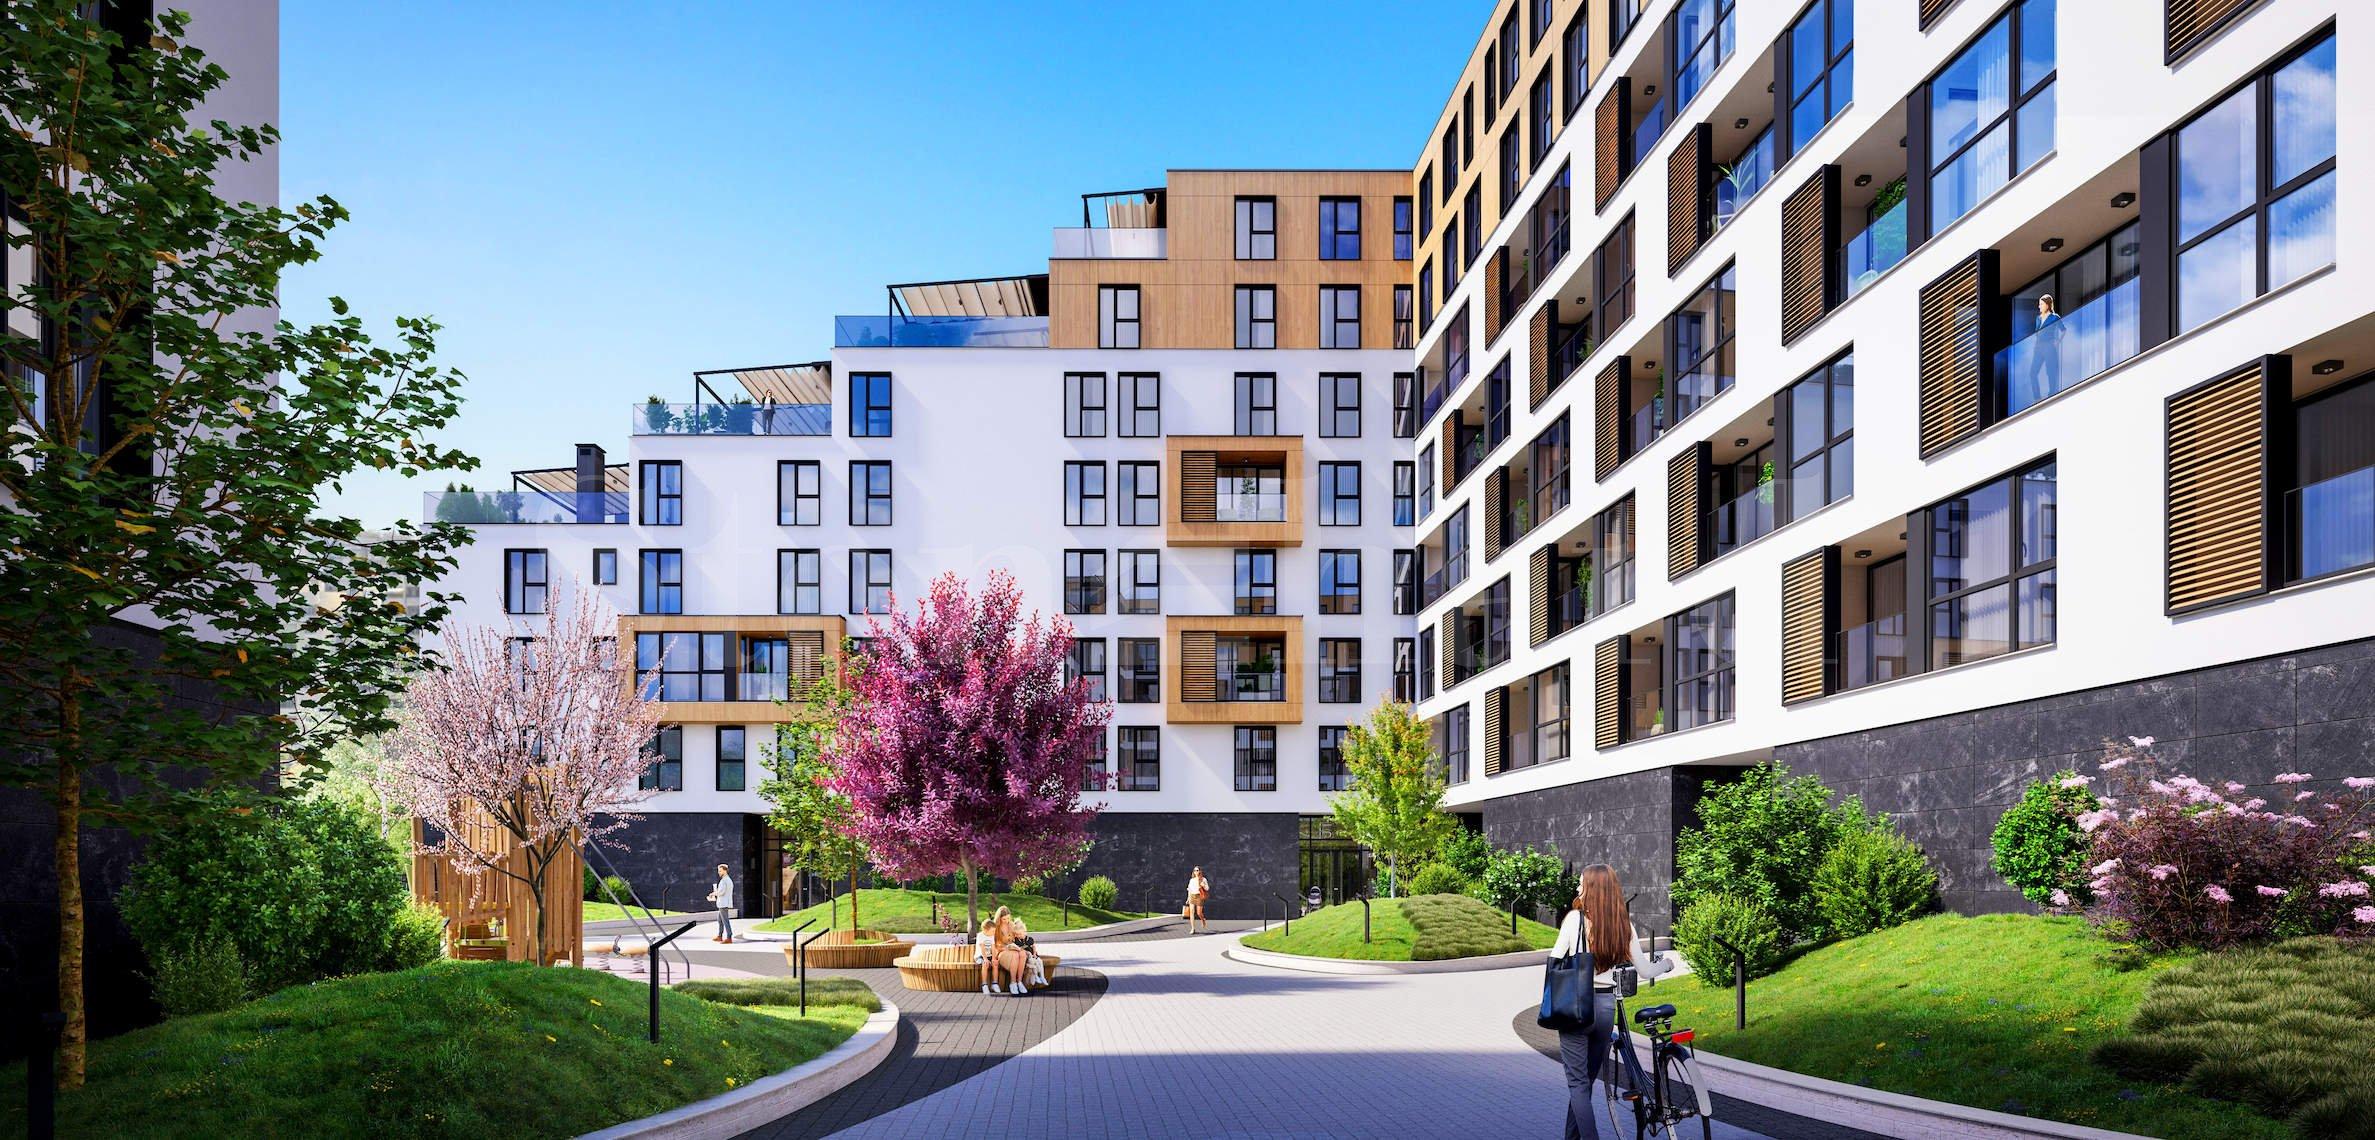 Нови апартаменти в популярен комплекс до Mall Plovdiv и парк Отдих и култура2 - Stonehard